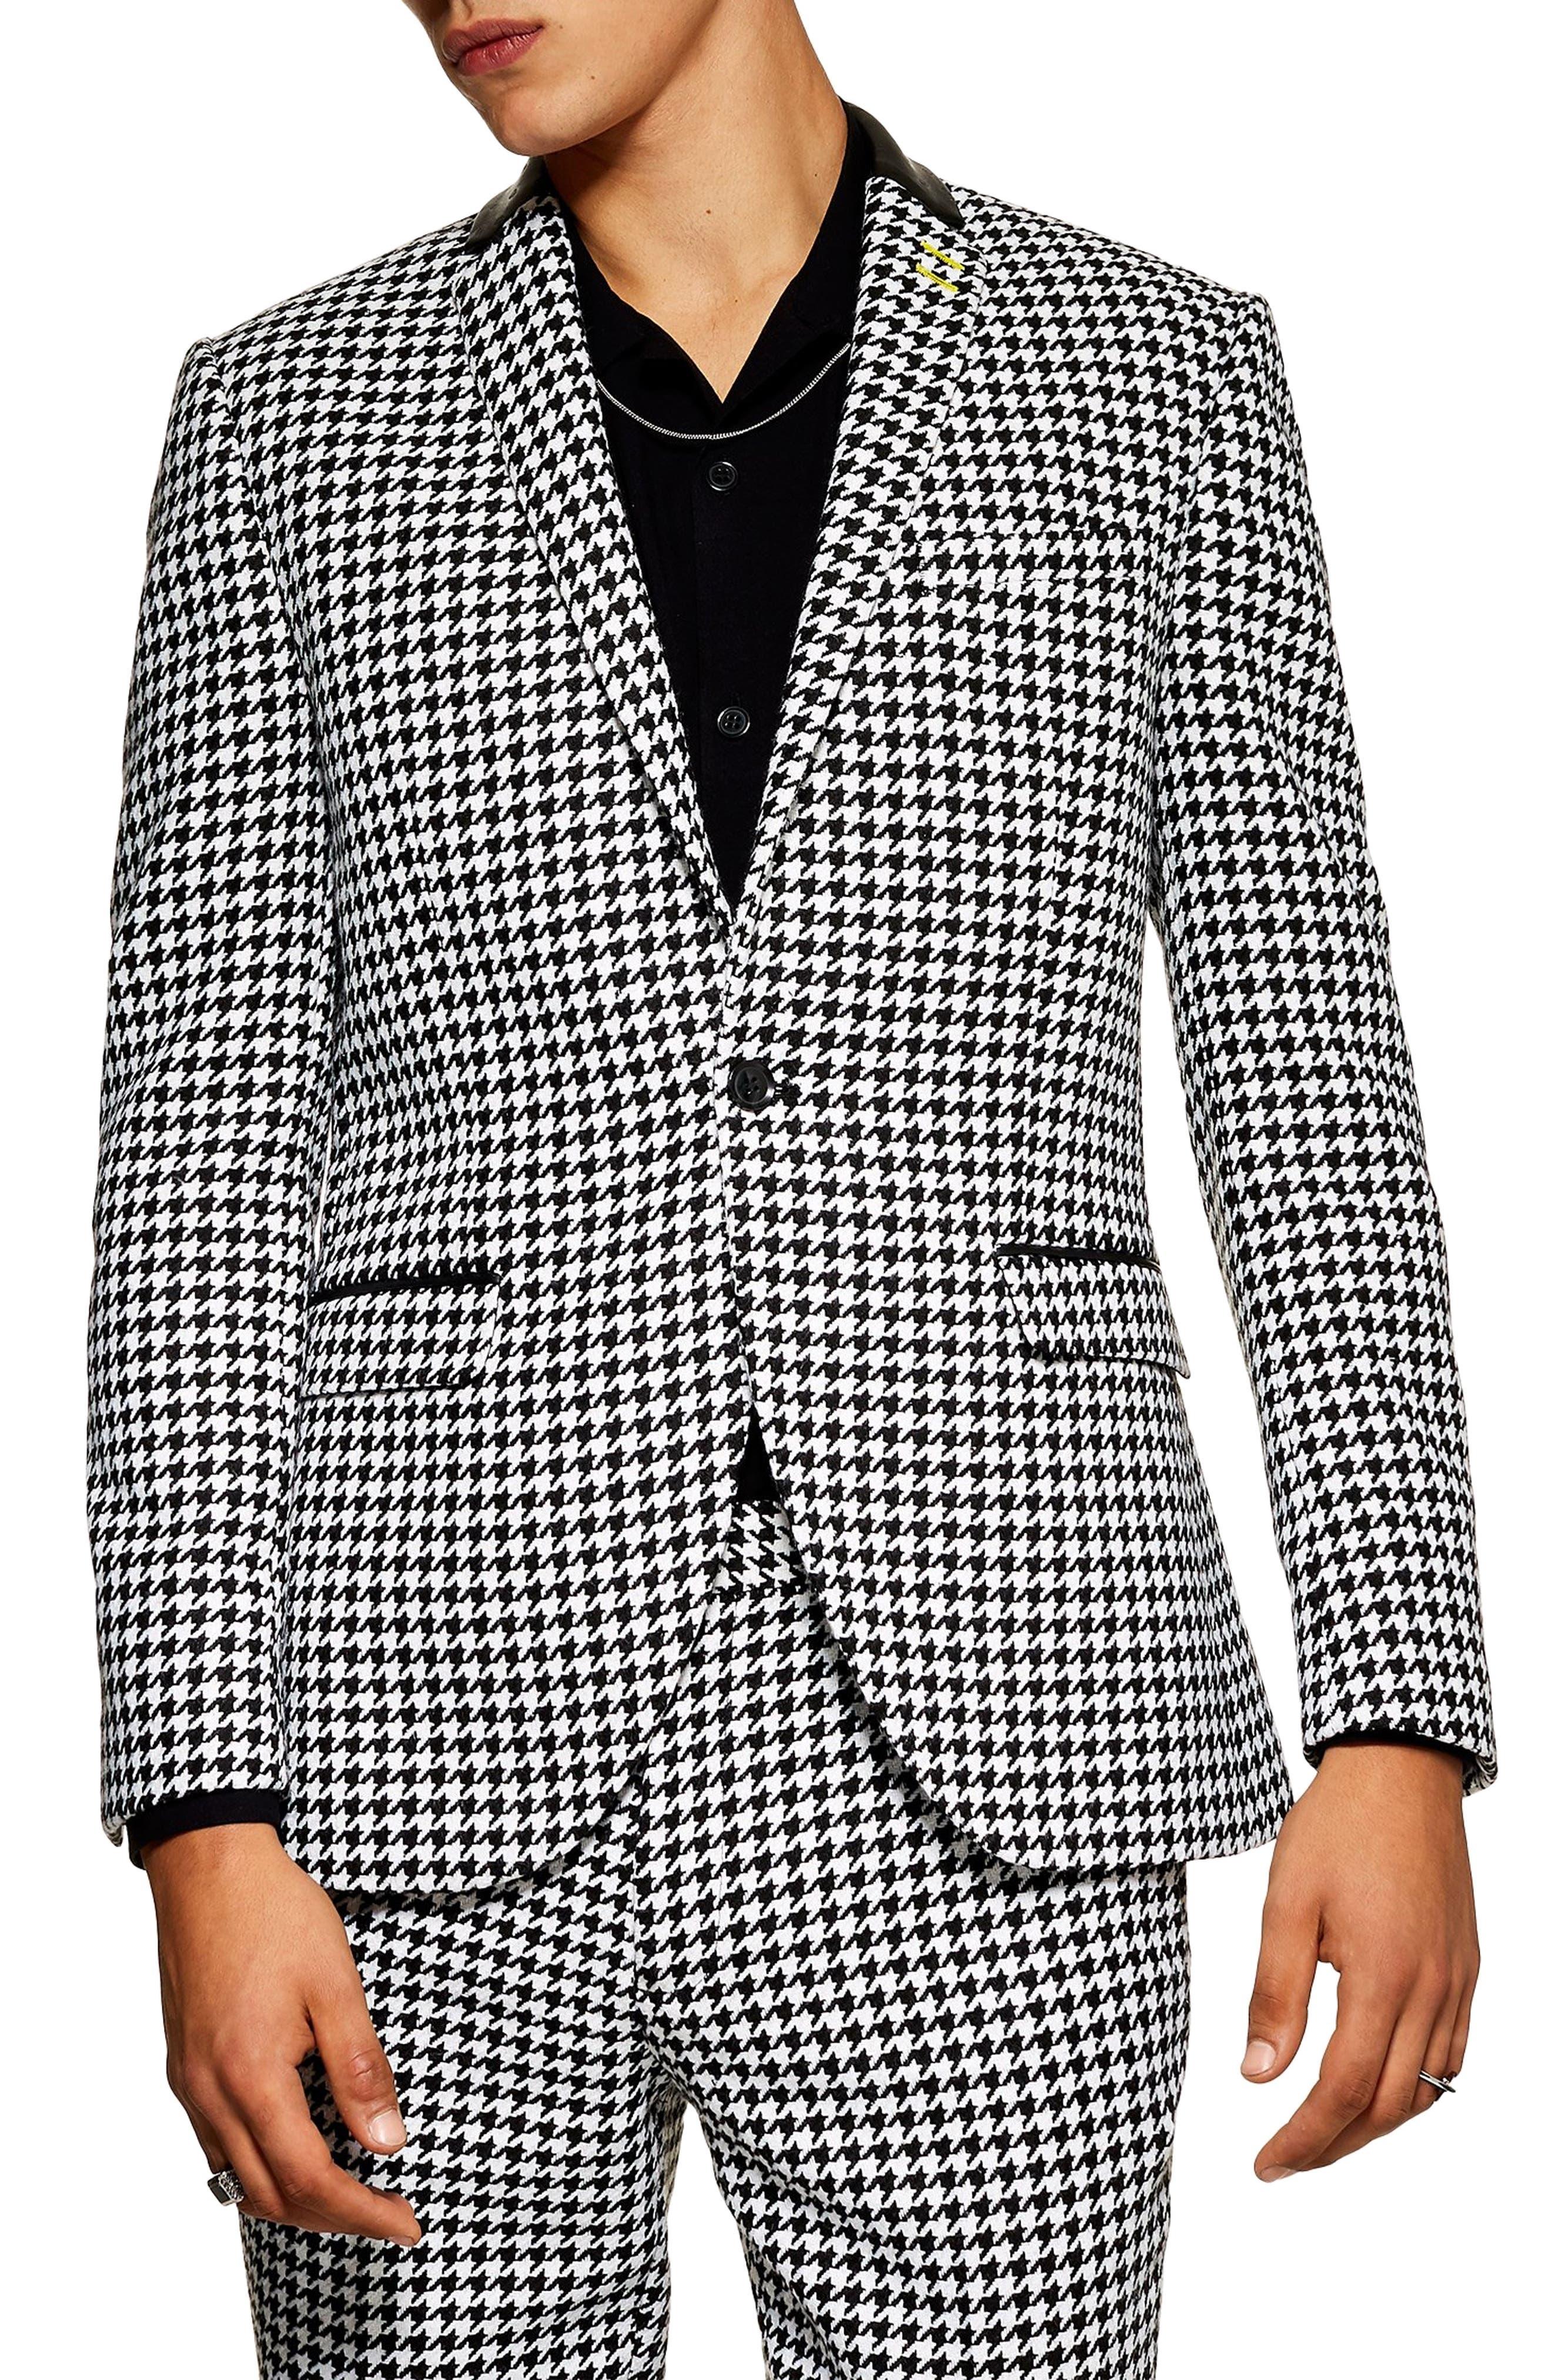 TOPMAN, Roe Skinny Fit Suit Jacket, Main thumbnail 1, color, 001